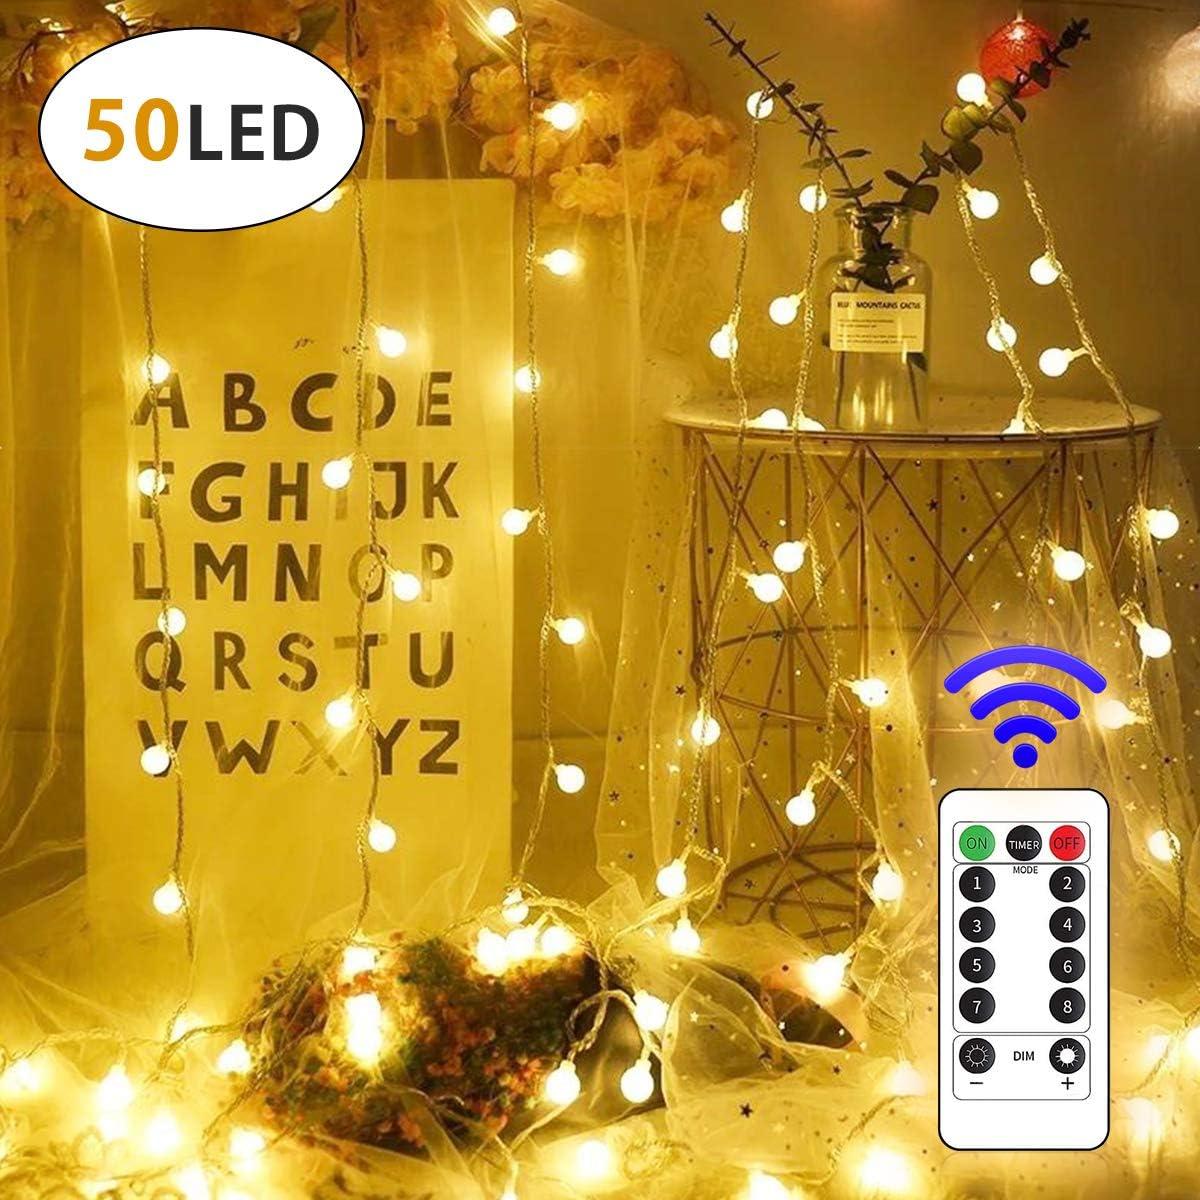 Lamantt 50 LED 19.7 FT Globe String Lights Twinkle Lights USB Plug WAS £15.99 NOW £7.99 w/code 3E3RTBFC @ Amazon